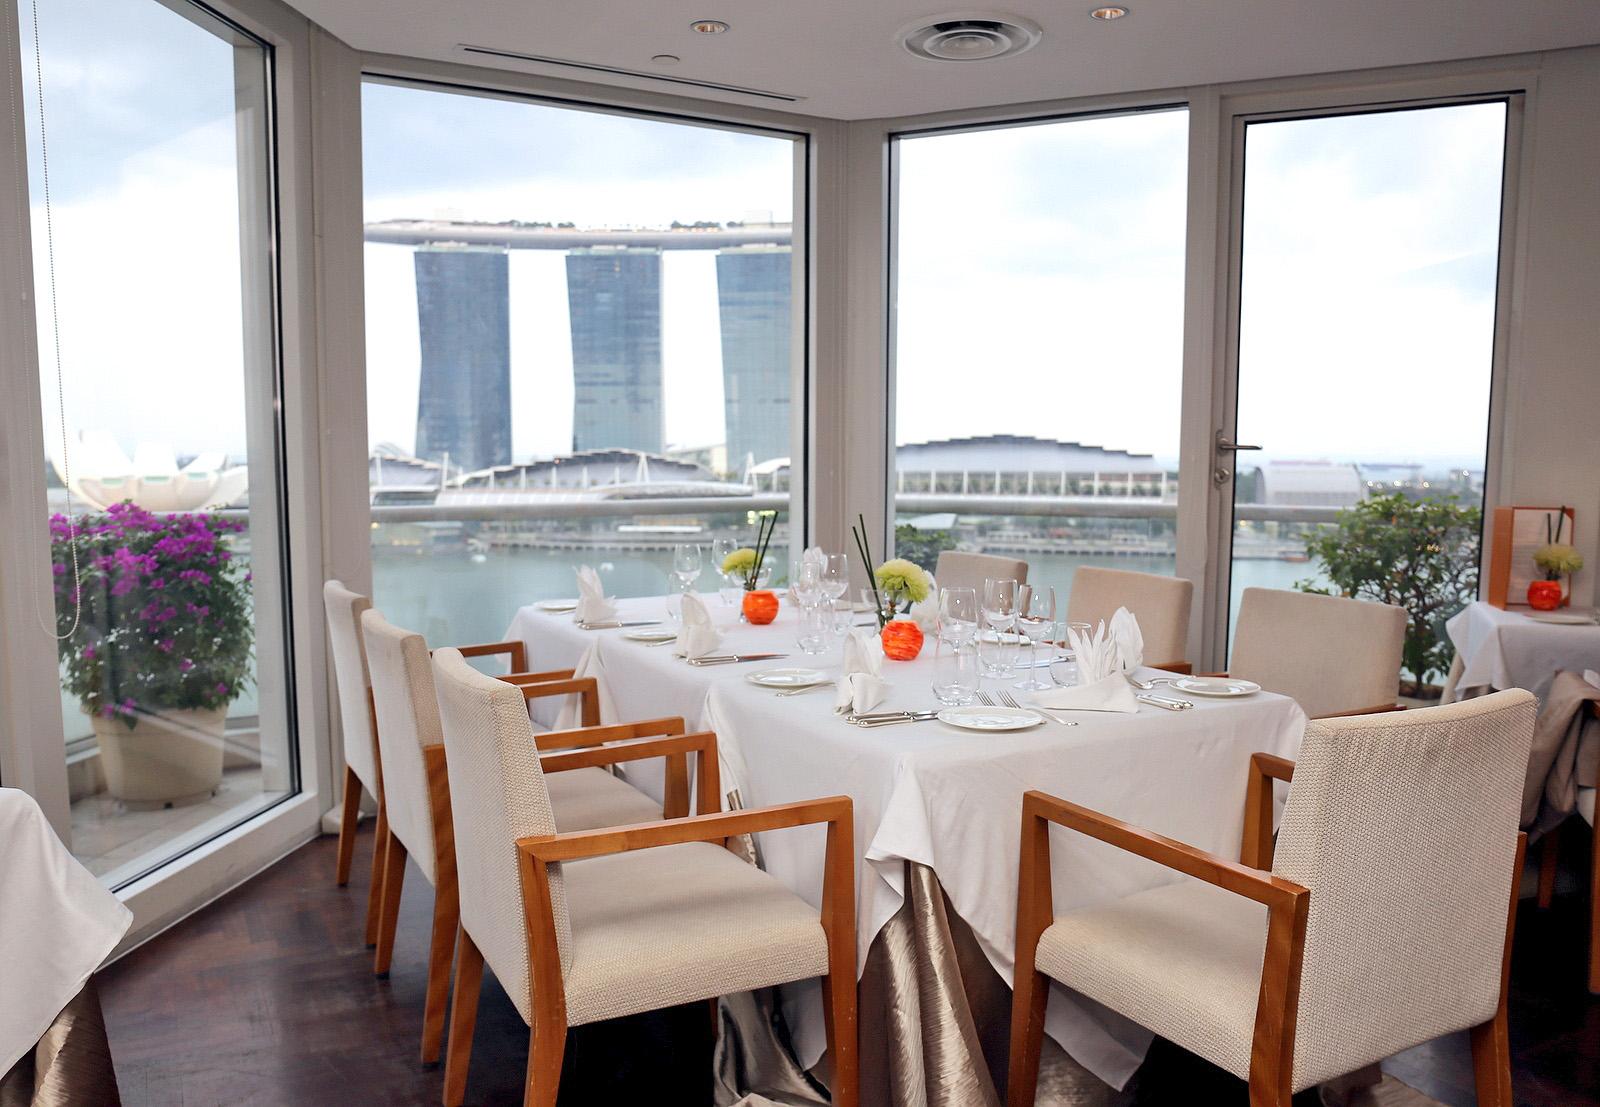 The Lighthouse Restaurant Presents Cucina Costiera Southern Italian Cuisine